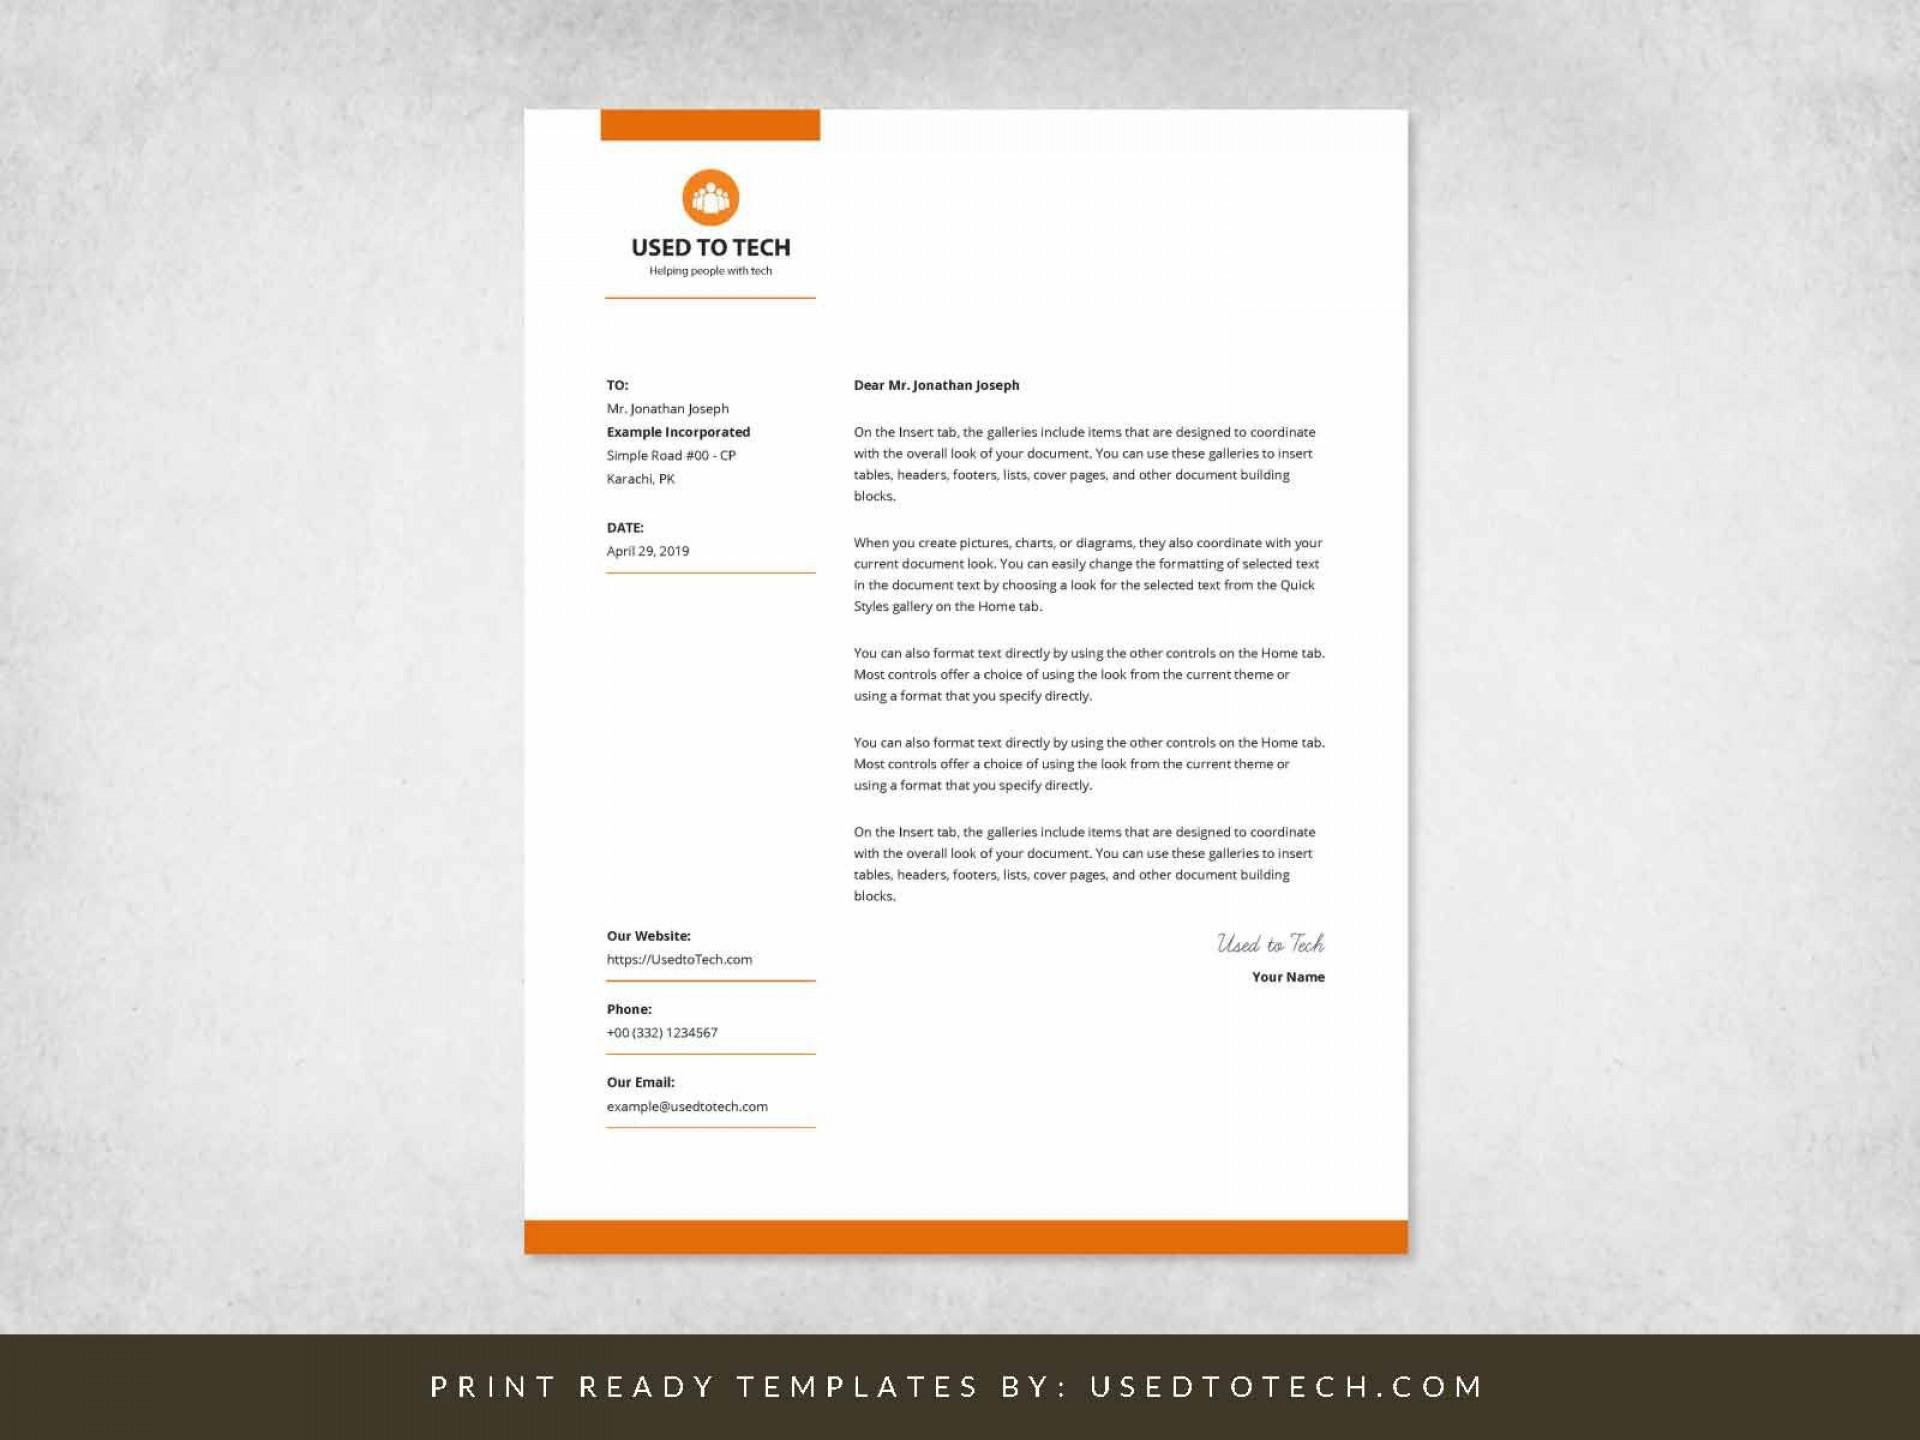 000 Wonderful Company Letterhead Template Word Idea  Busines 2007 Free Download1920